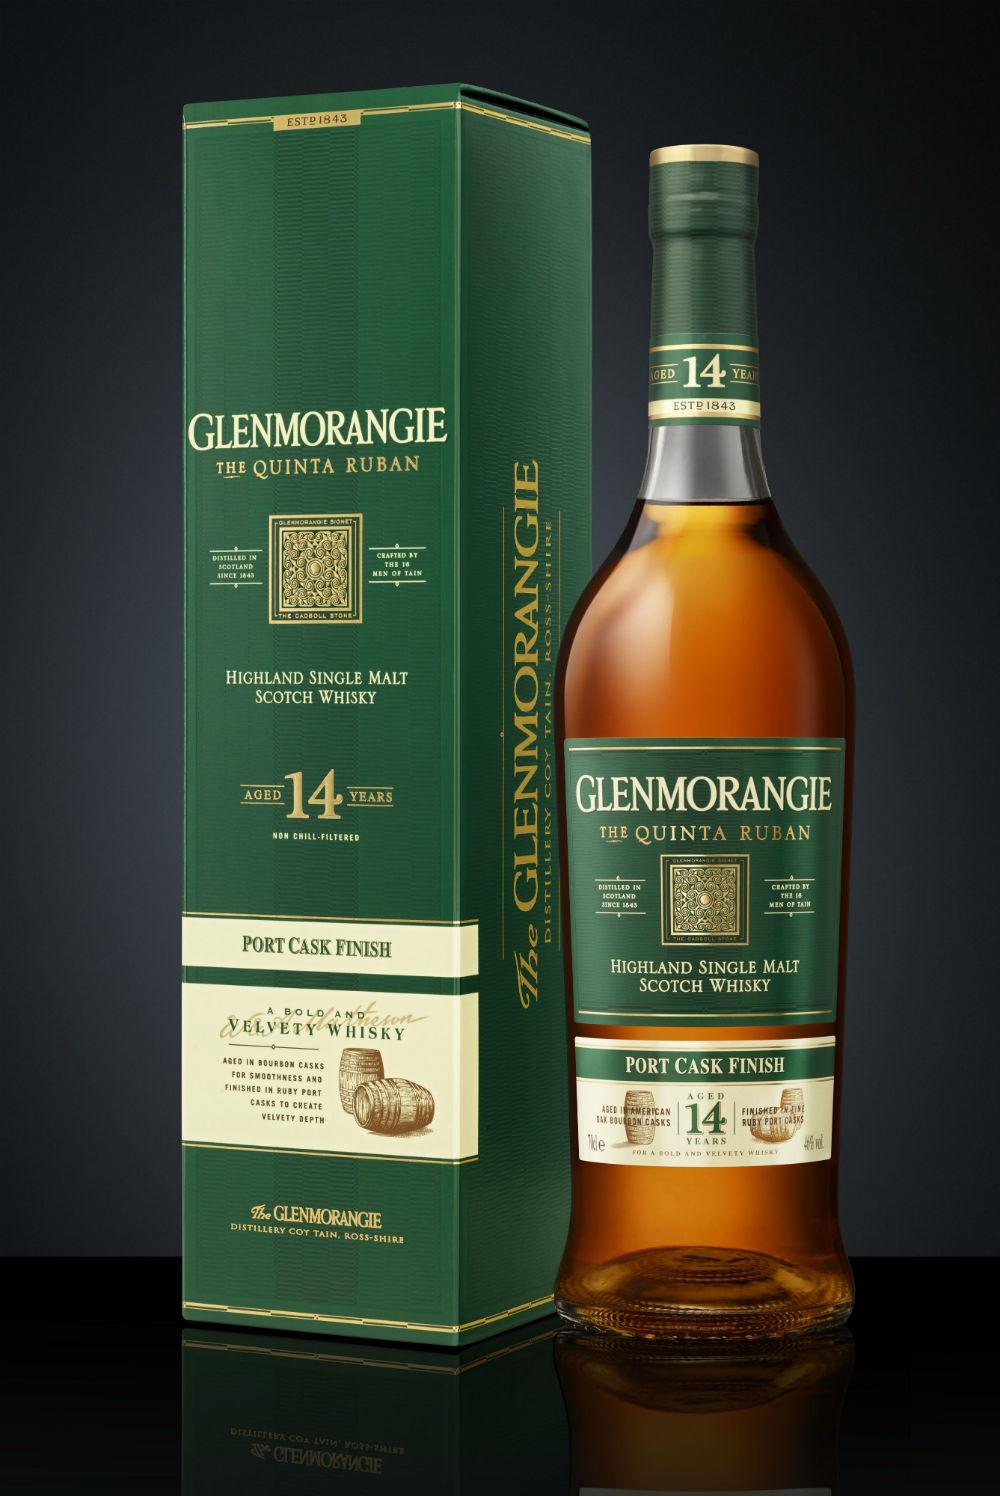 Glenmorangie Whisky Scoops Seven Awards At Prestigious Competition photo